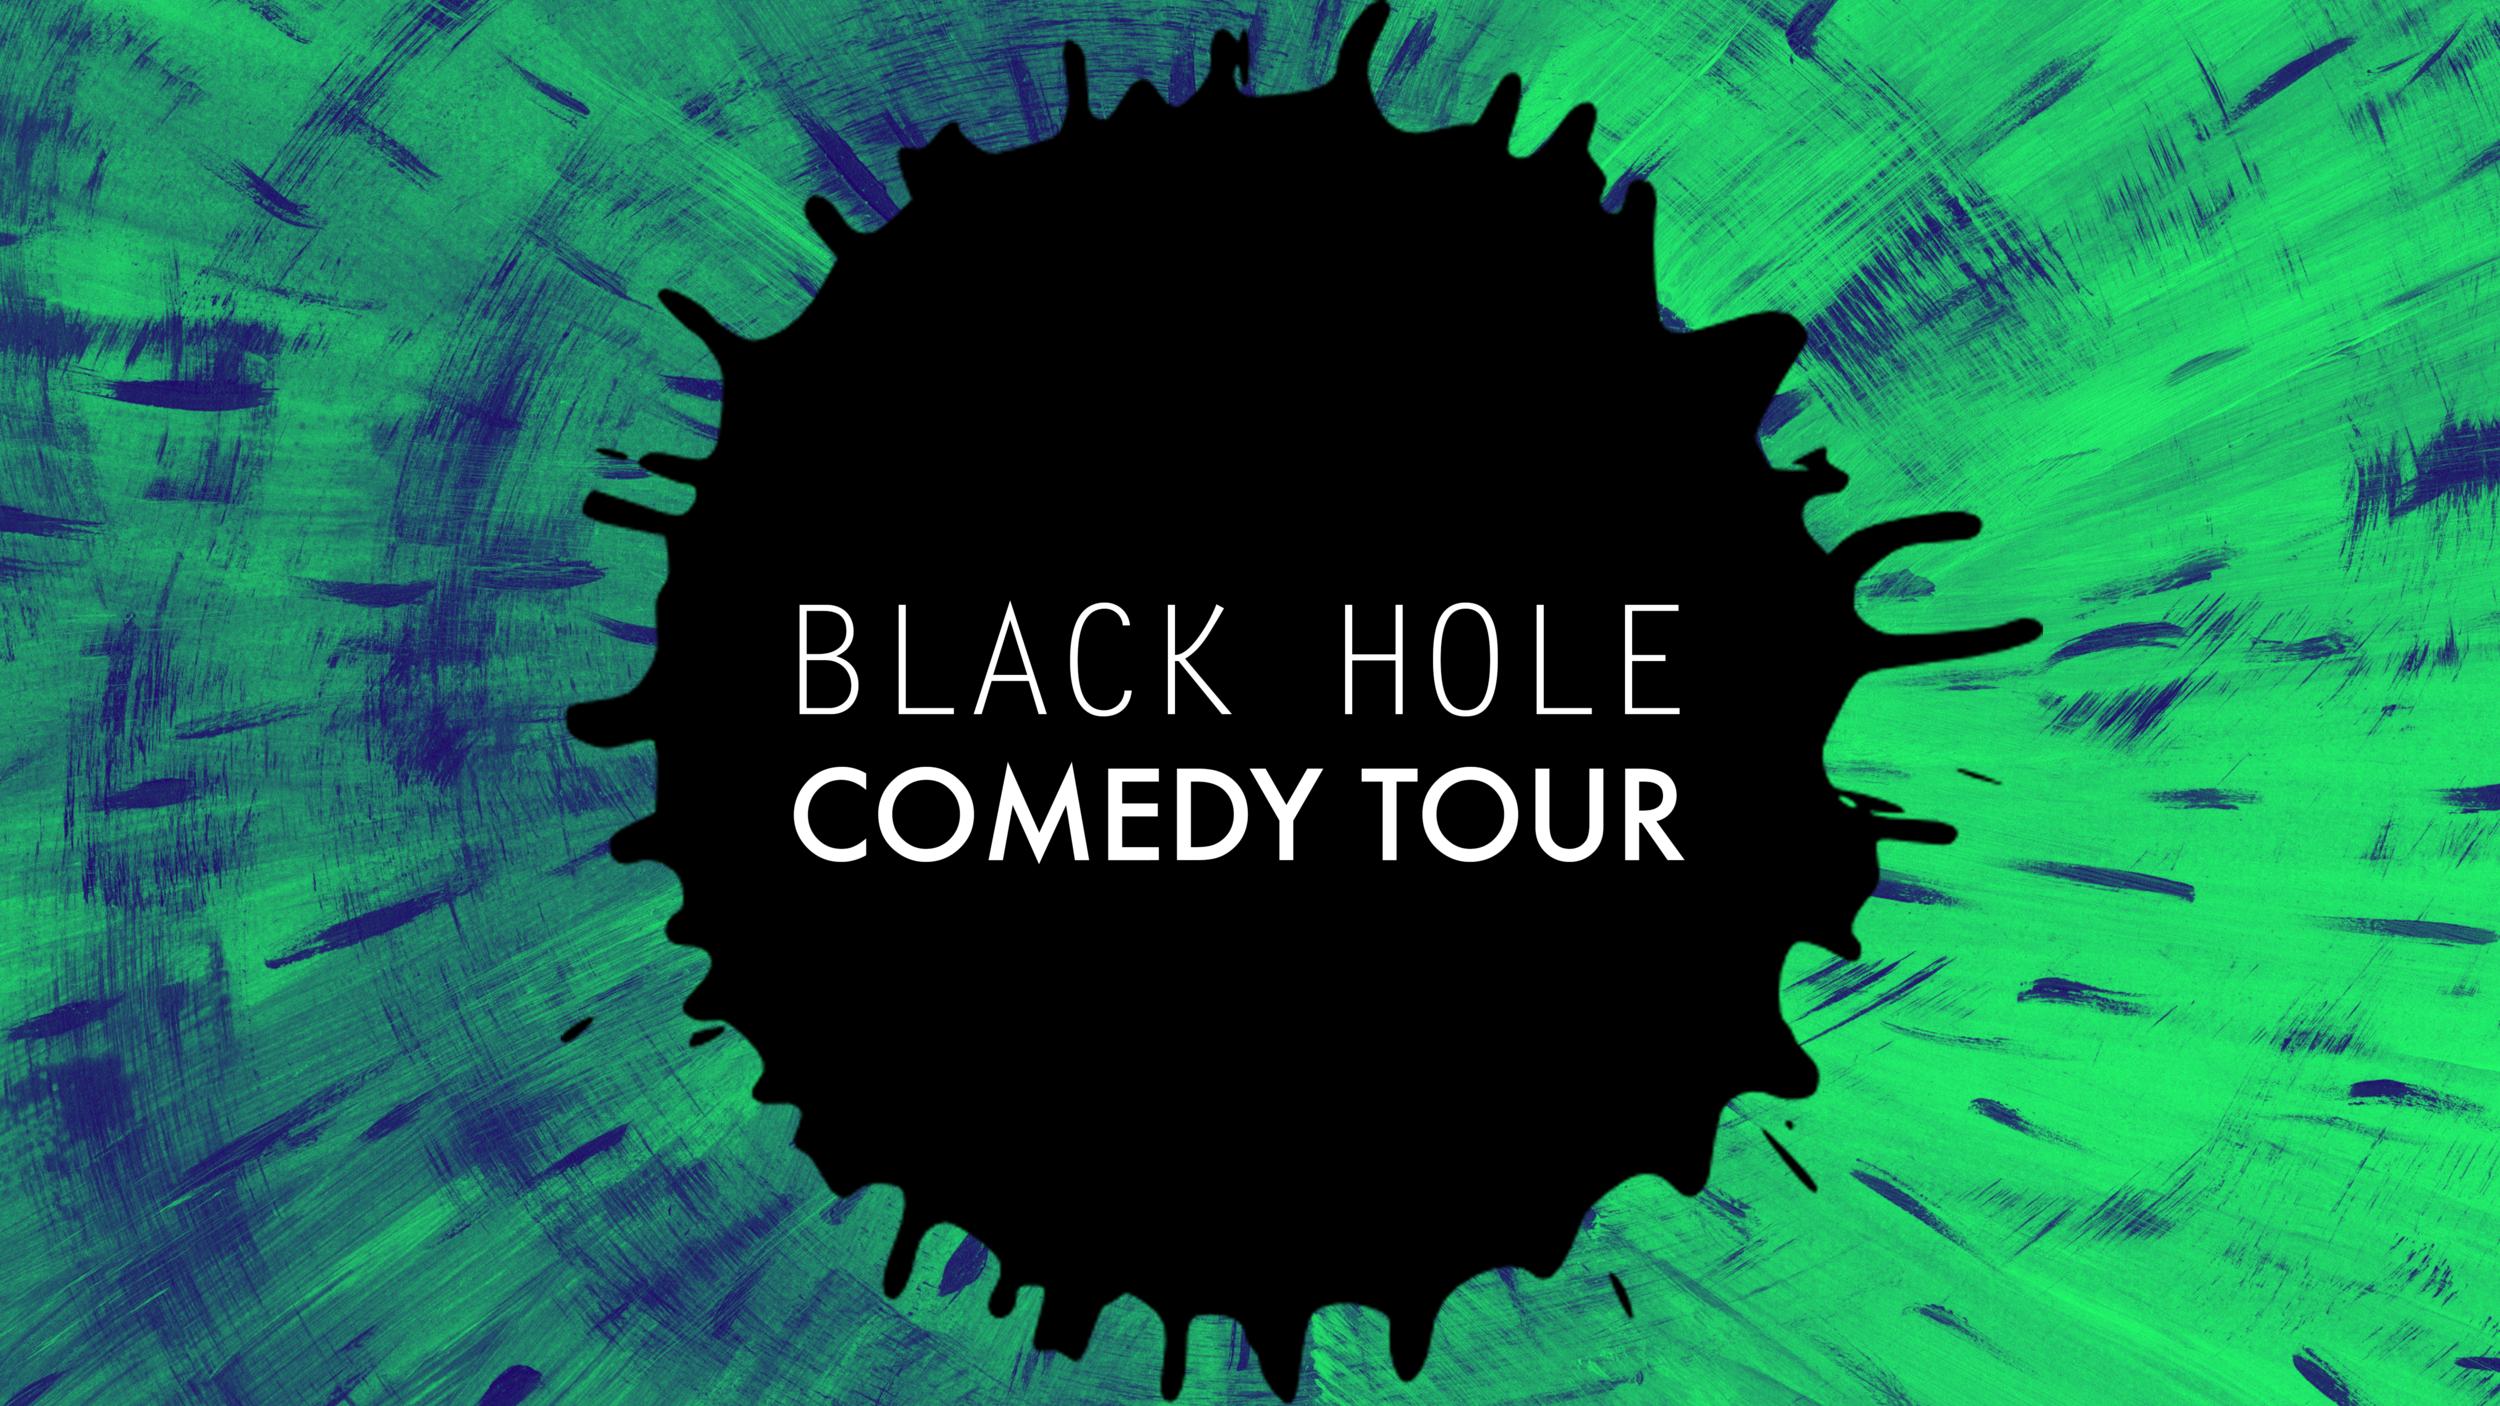 Black Hole Comedy Show Design Idea 2.png